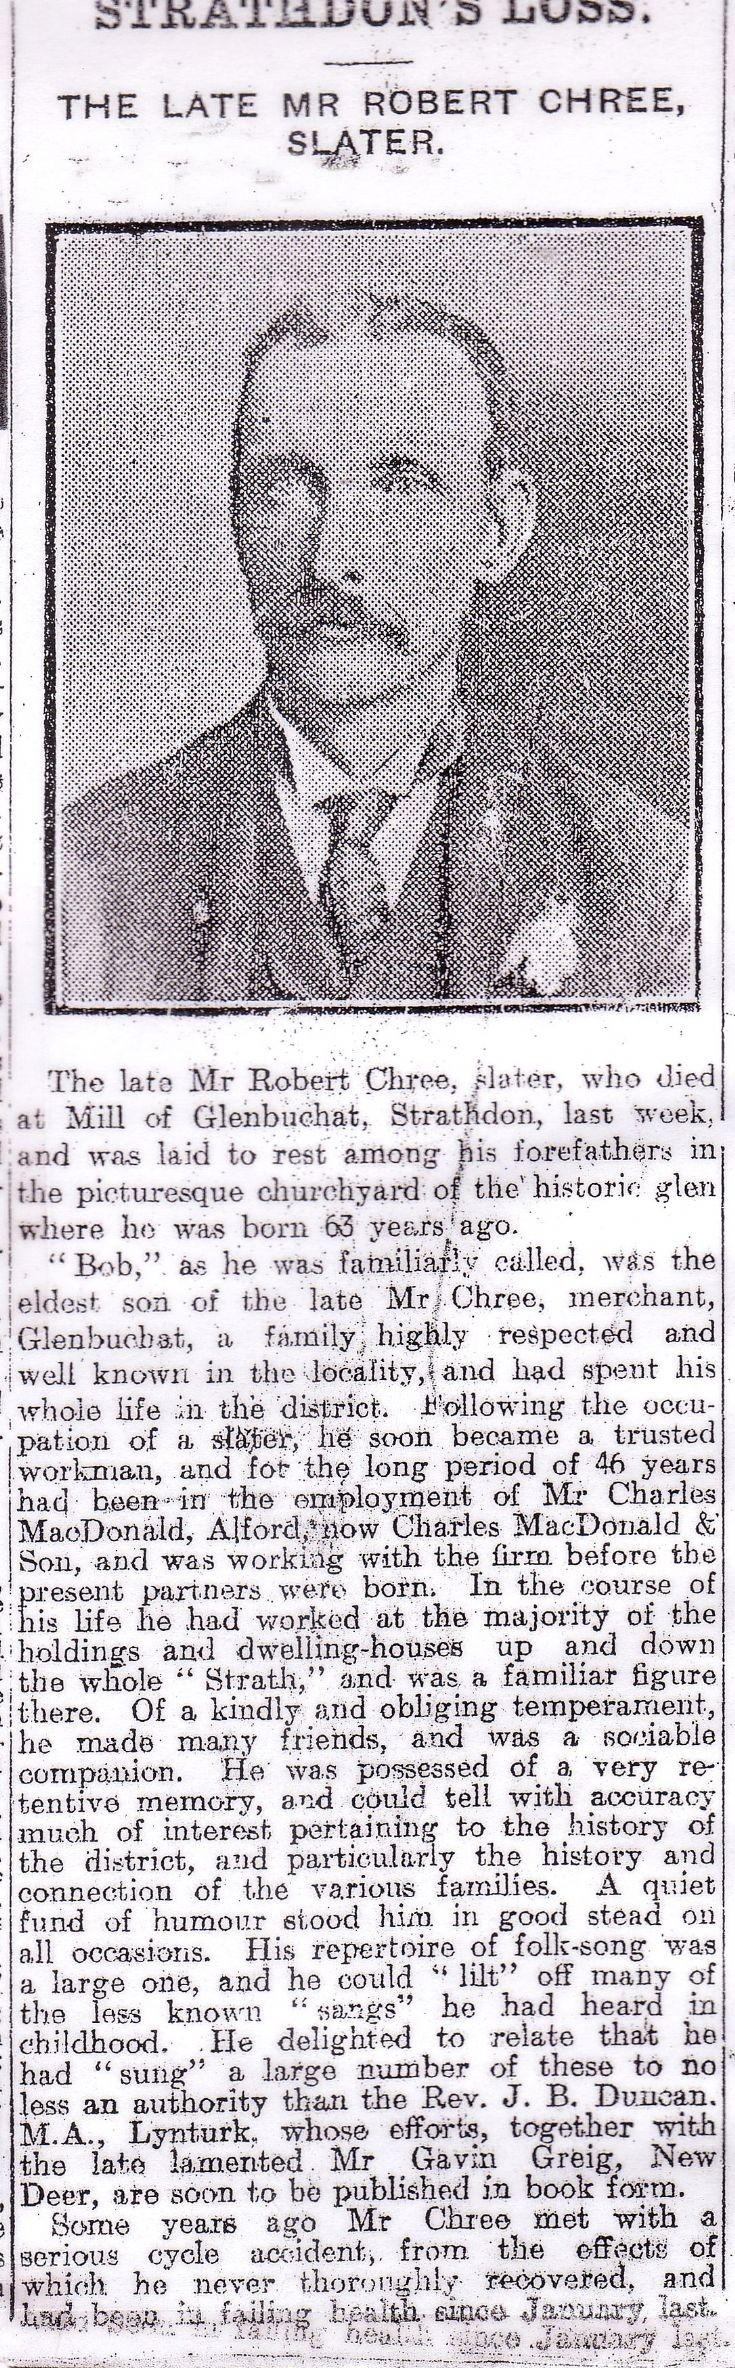 134 Robert Chree Obituary 1915